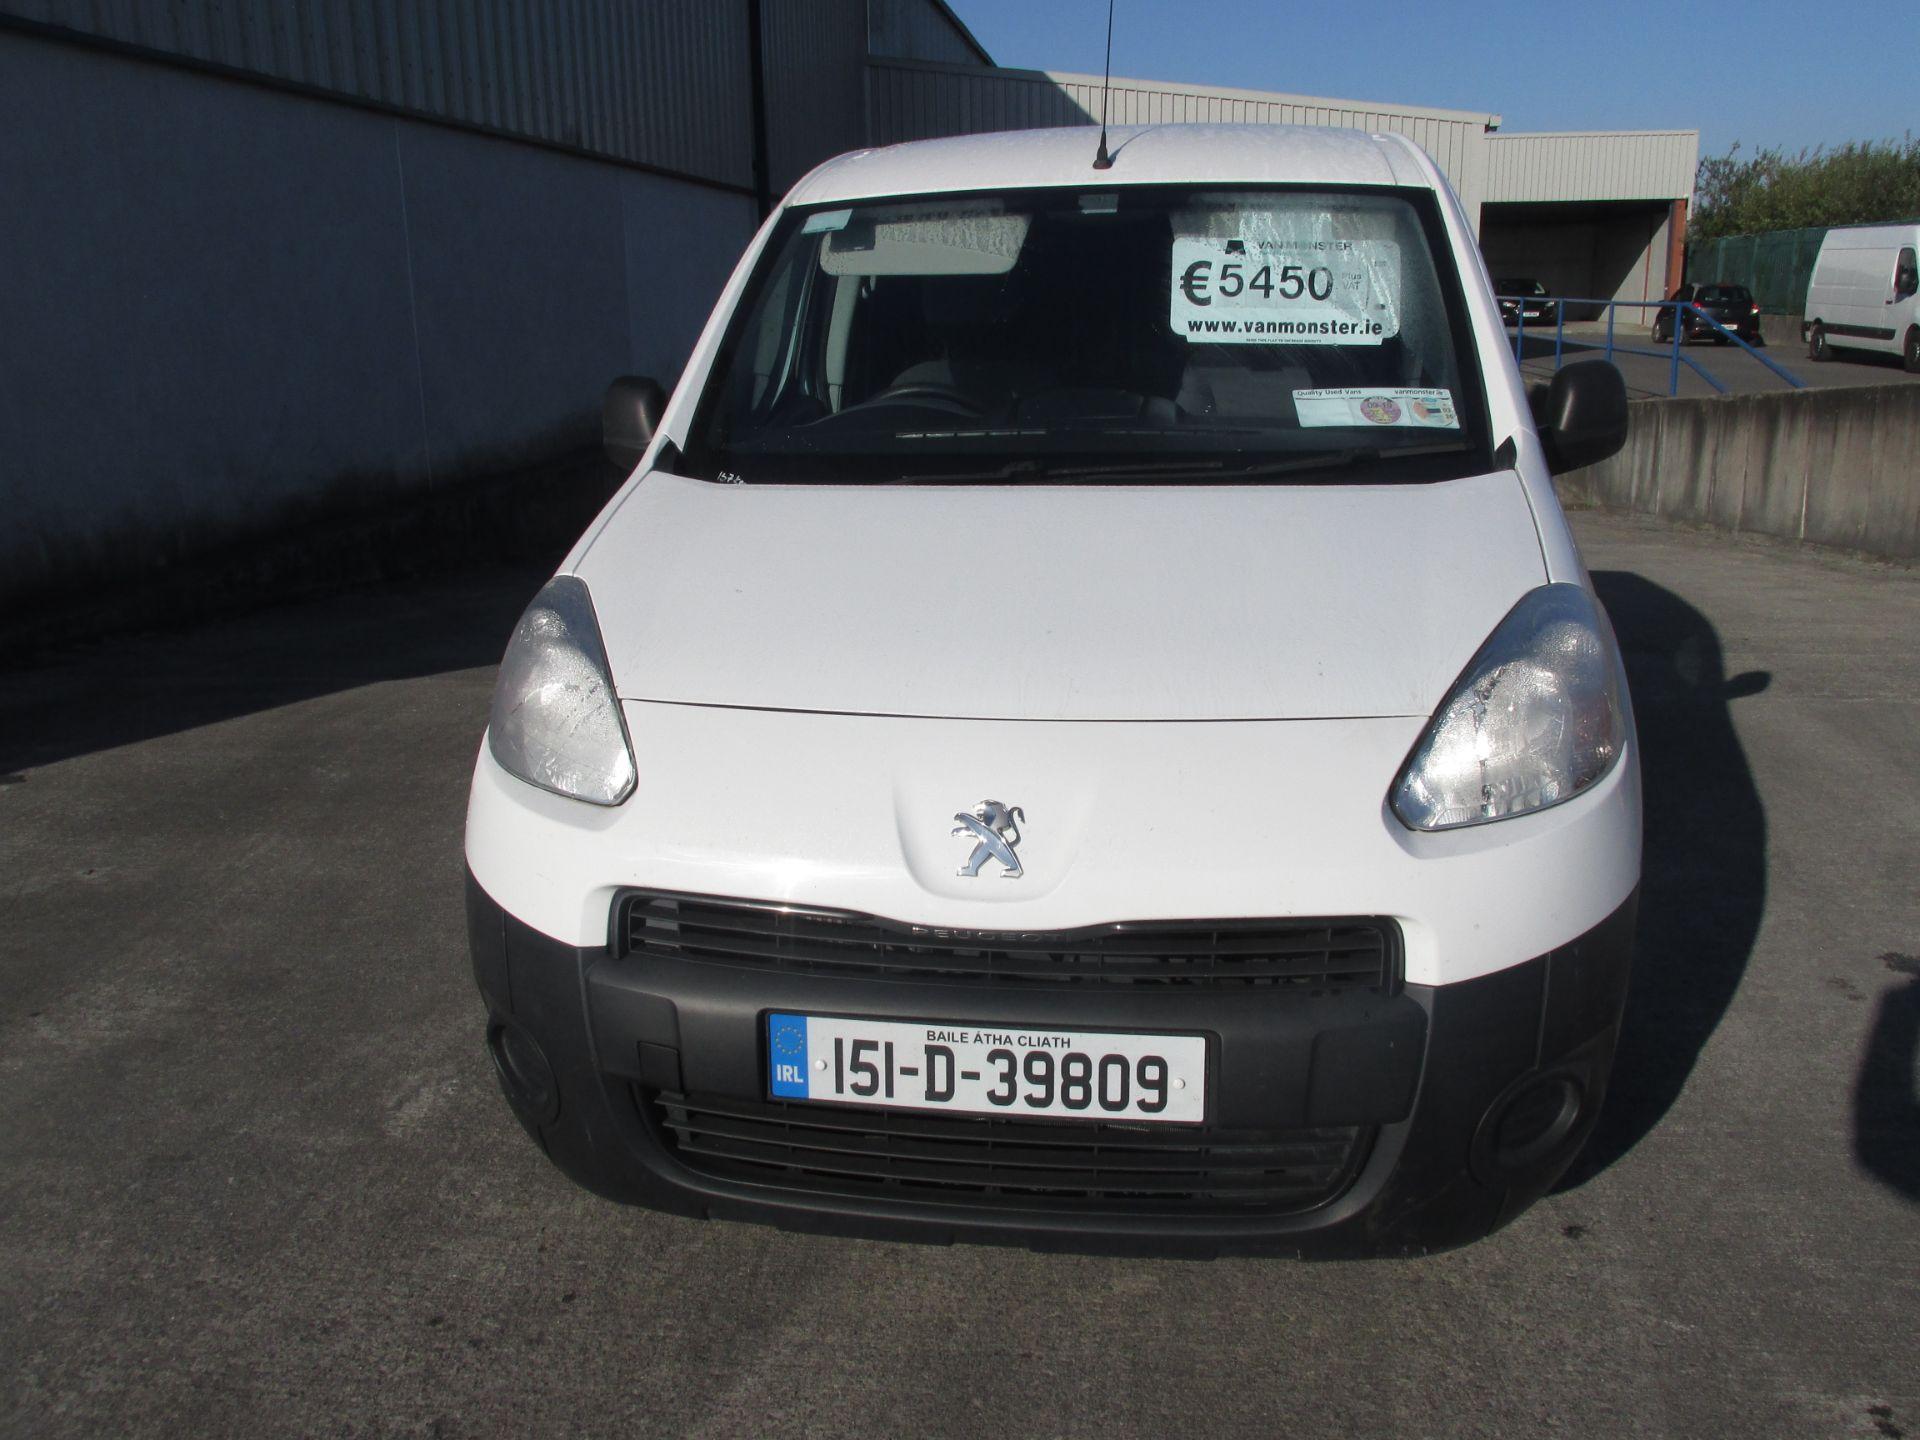 2015 Peugeot Partner HDI S L1 850 (151D39809) Image 2